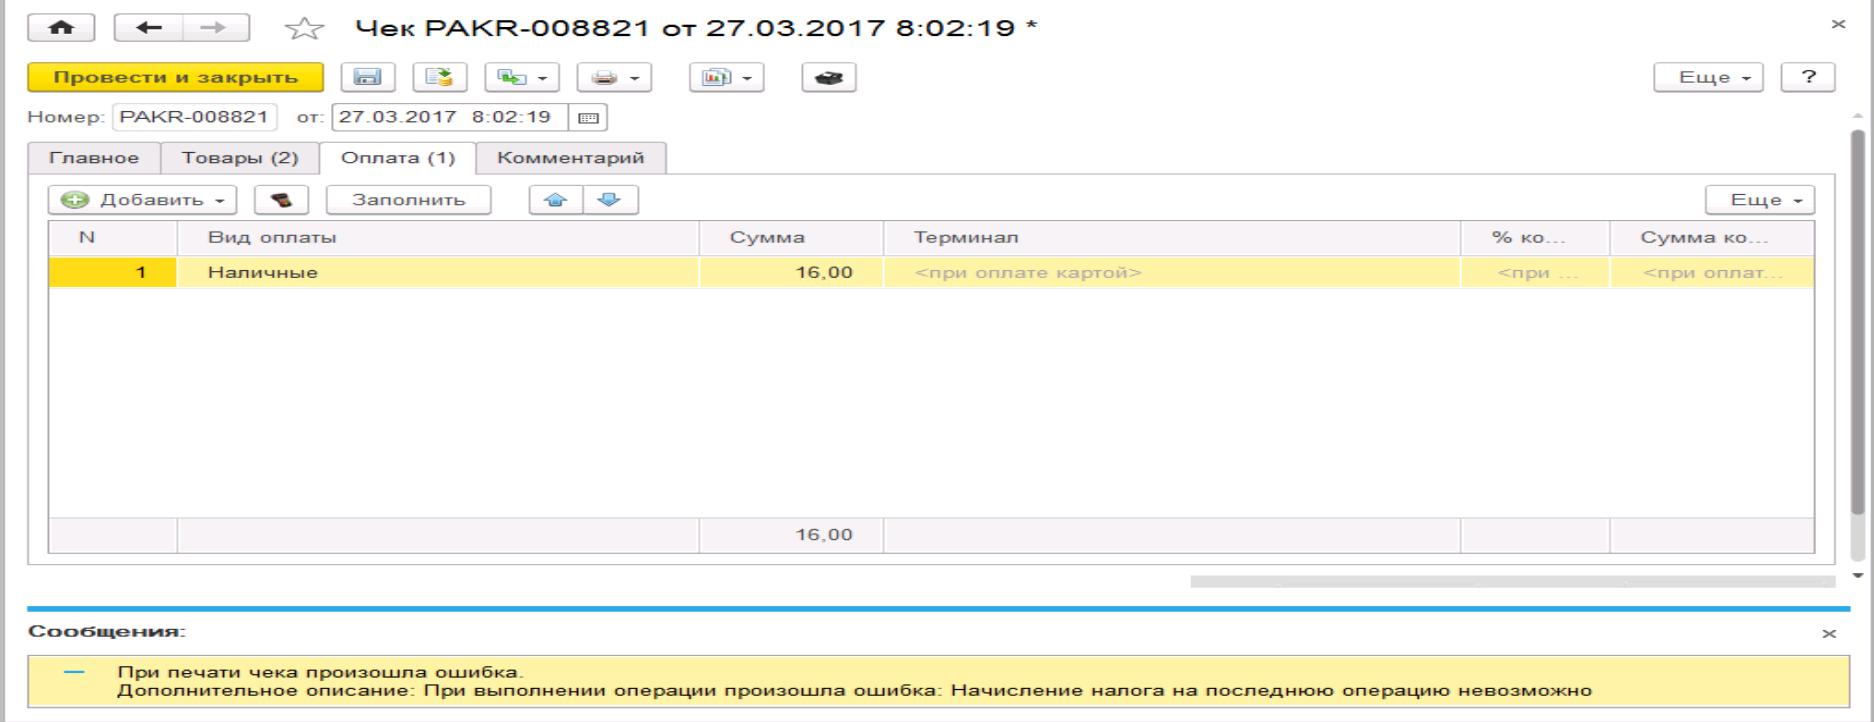 Теория, документы, отмена проведения - 1С - CyberForum